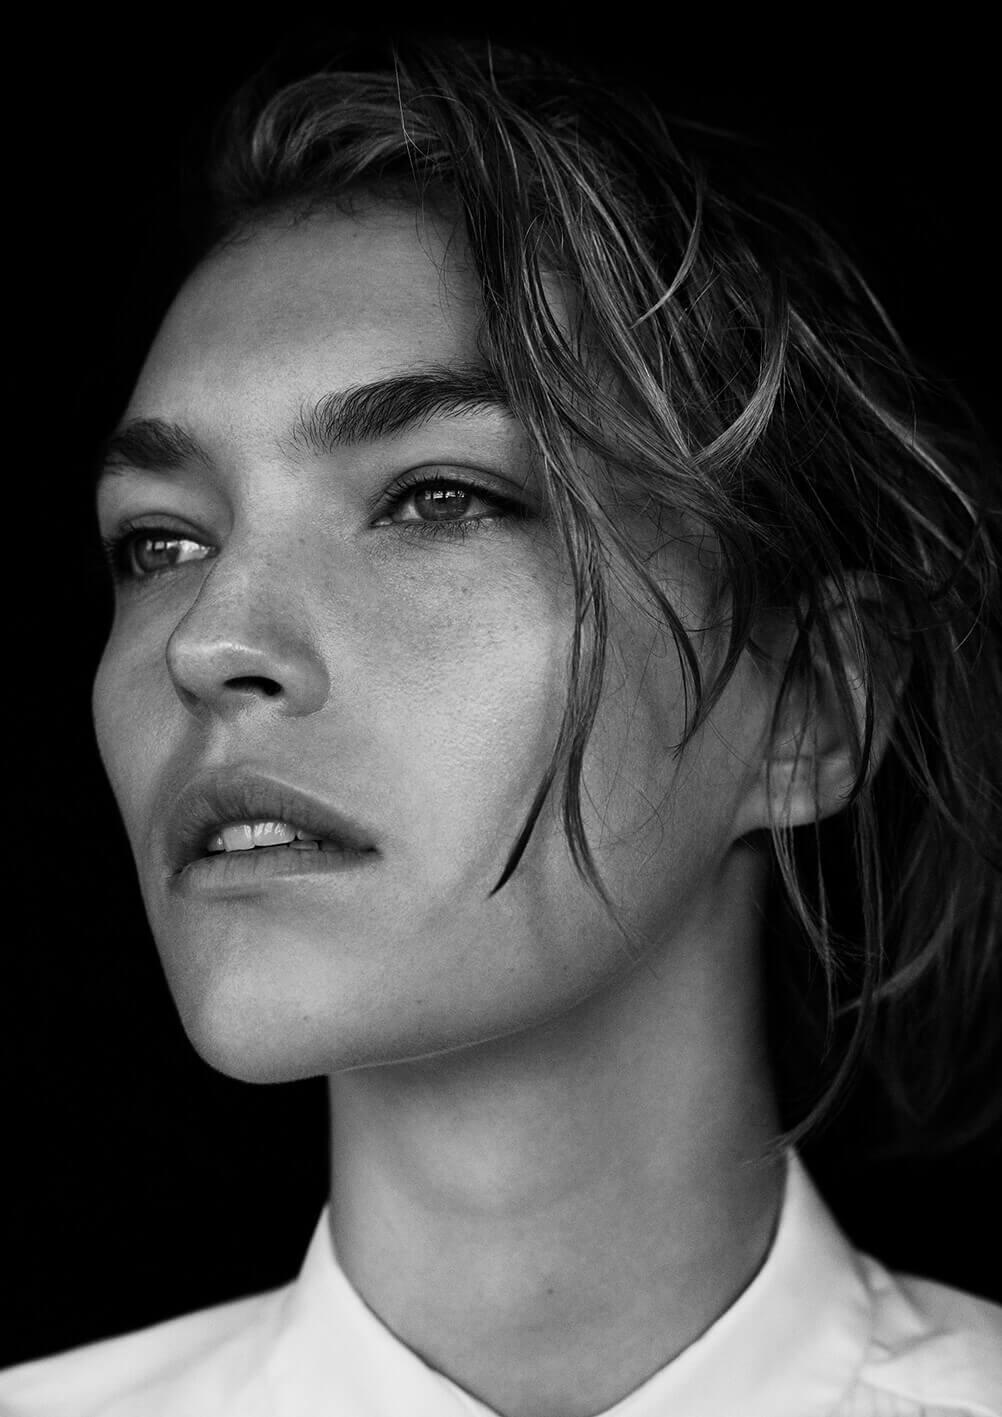 Portrait photography by Alex Waltl